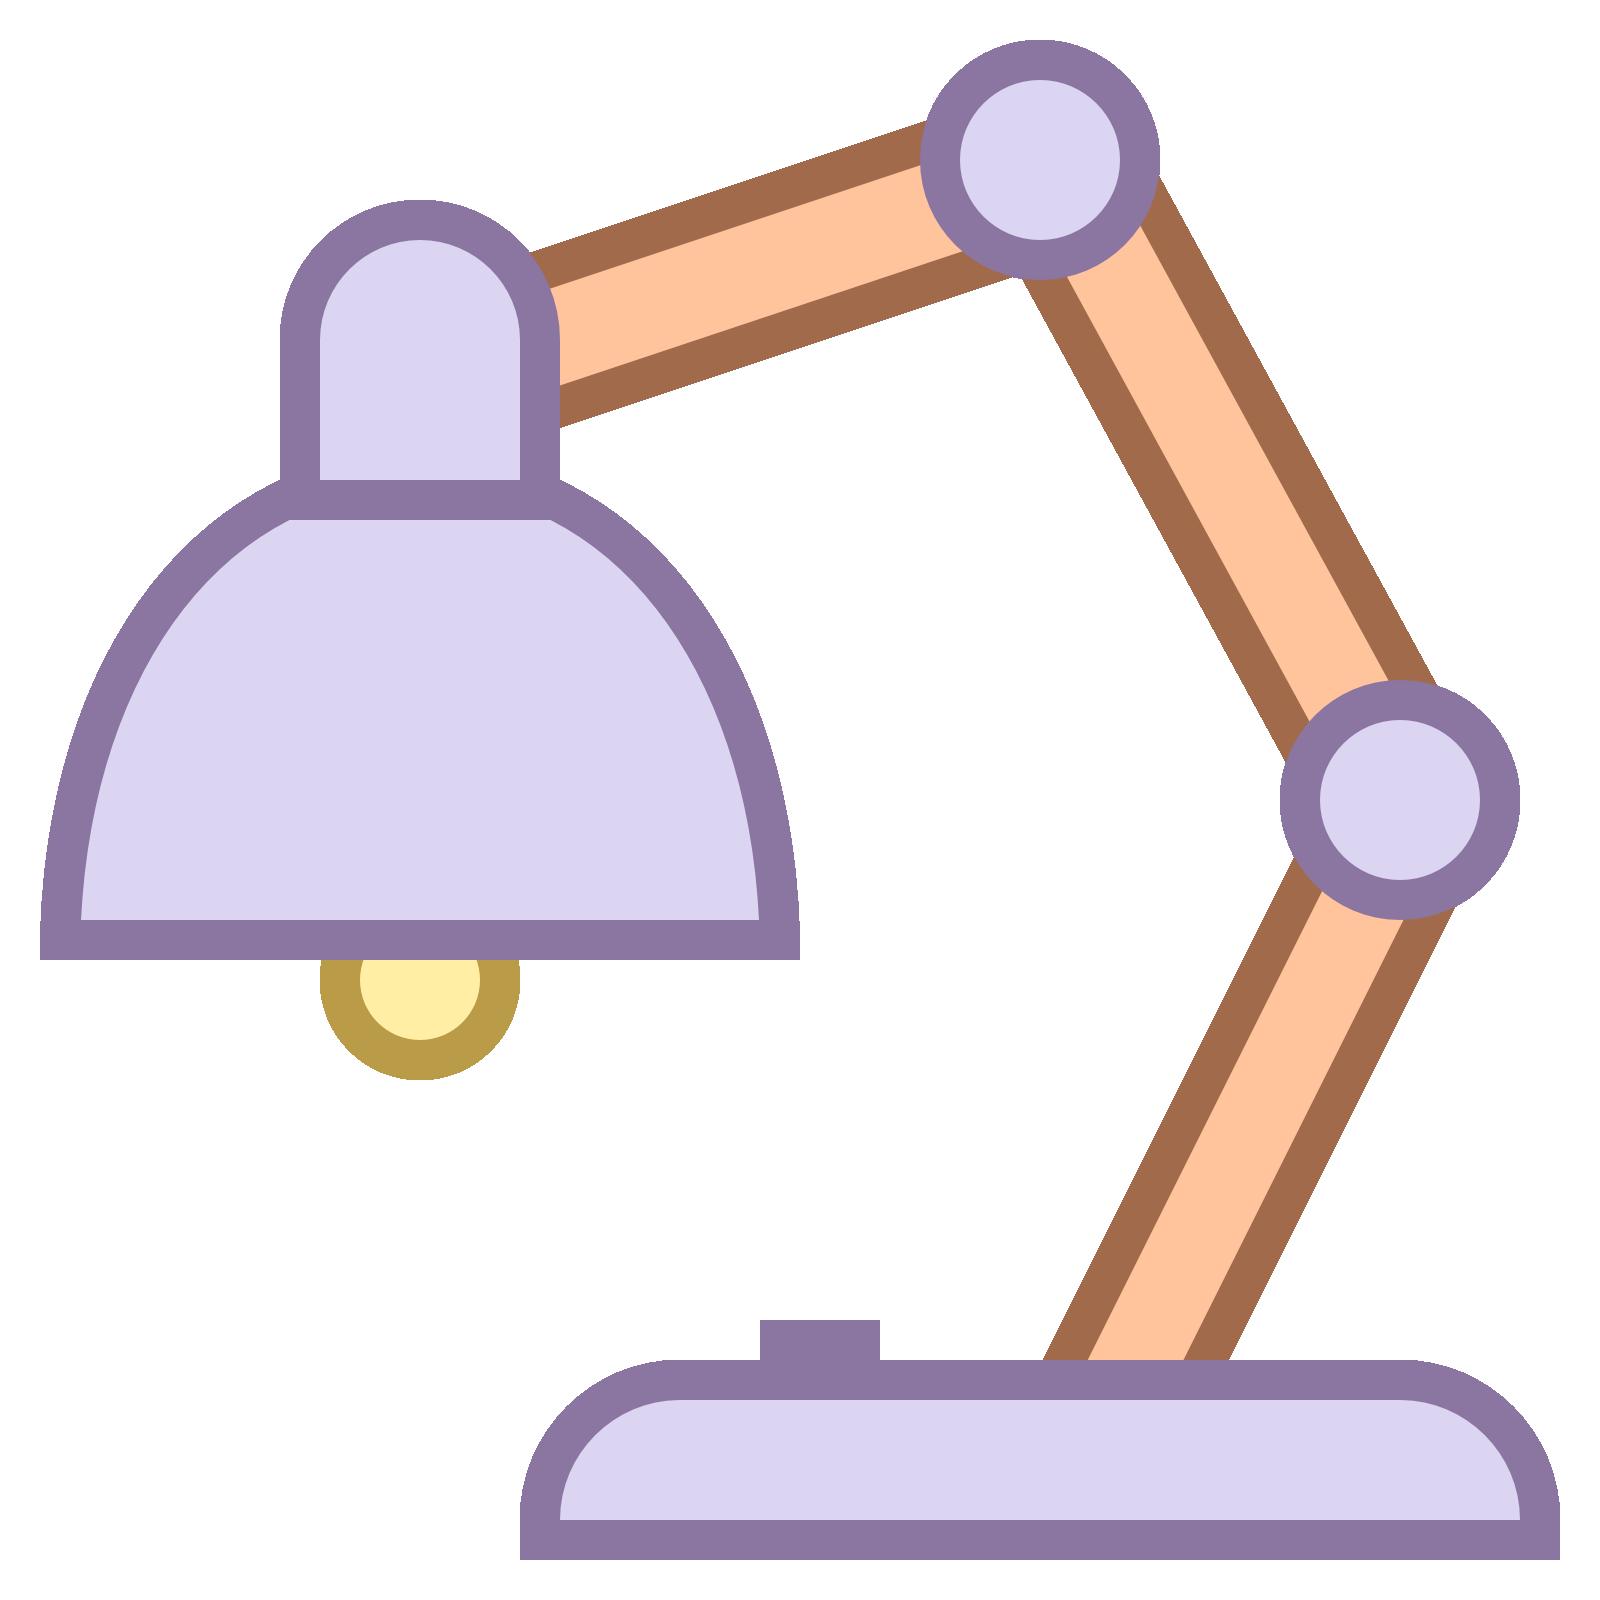 Lamp clipart furniture. Desk transparent icon web